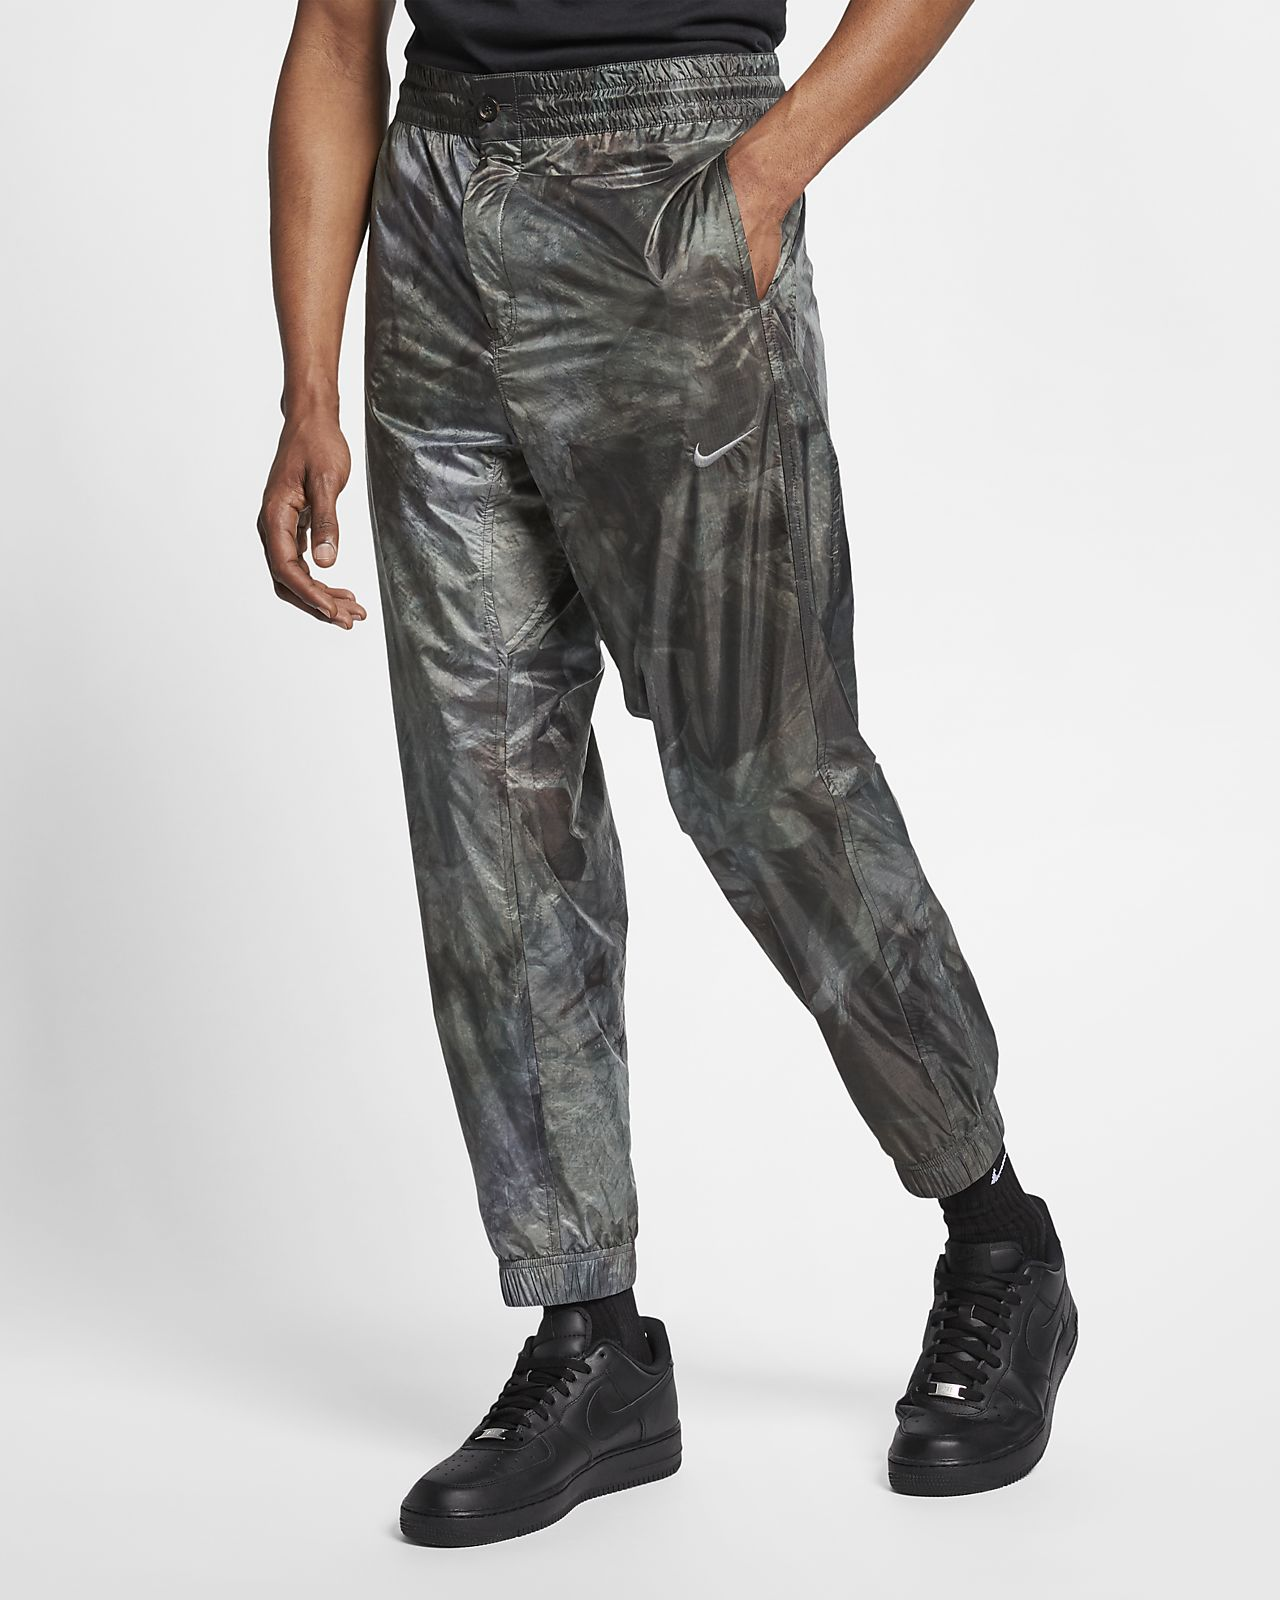 NikeLab Made in Italy 系列男款田徑運動褲